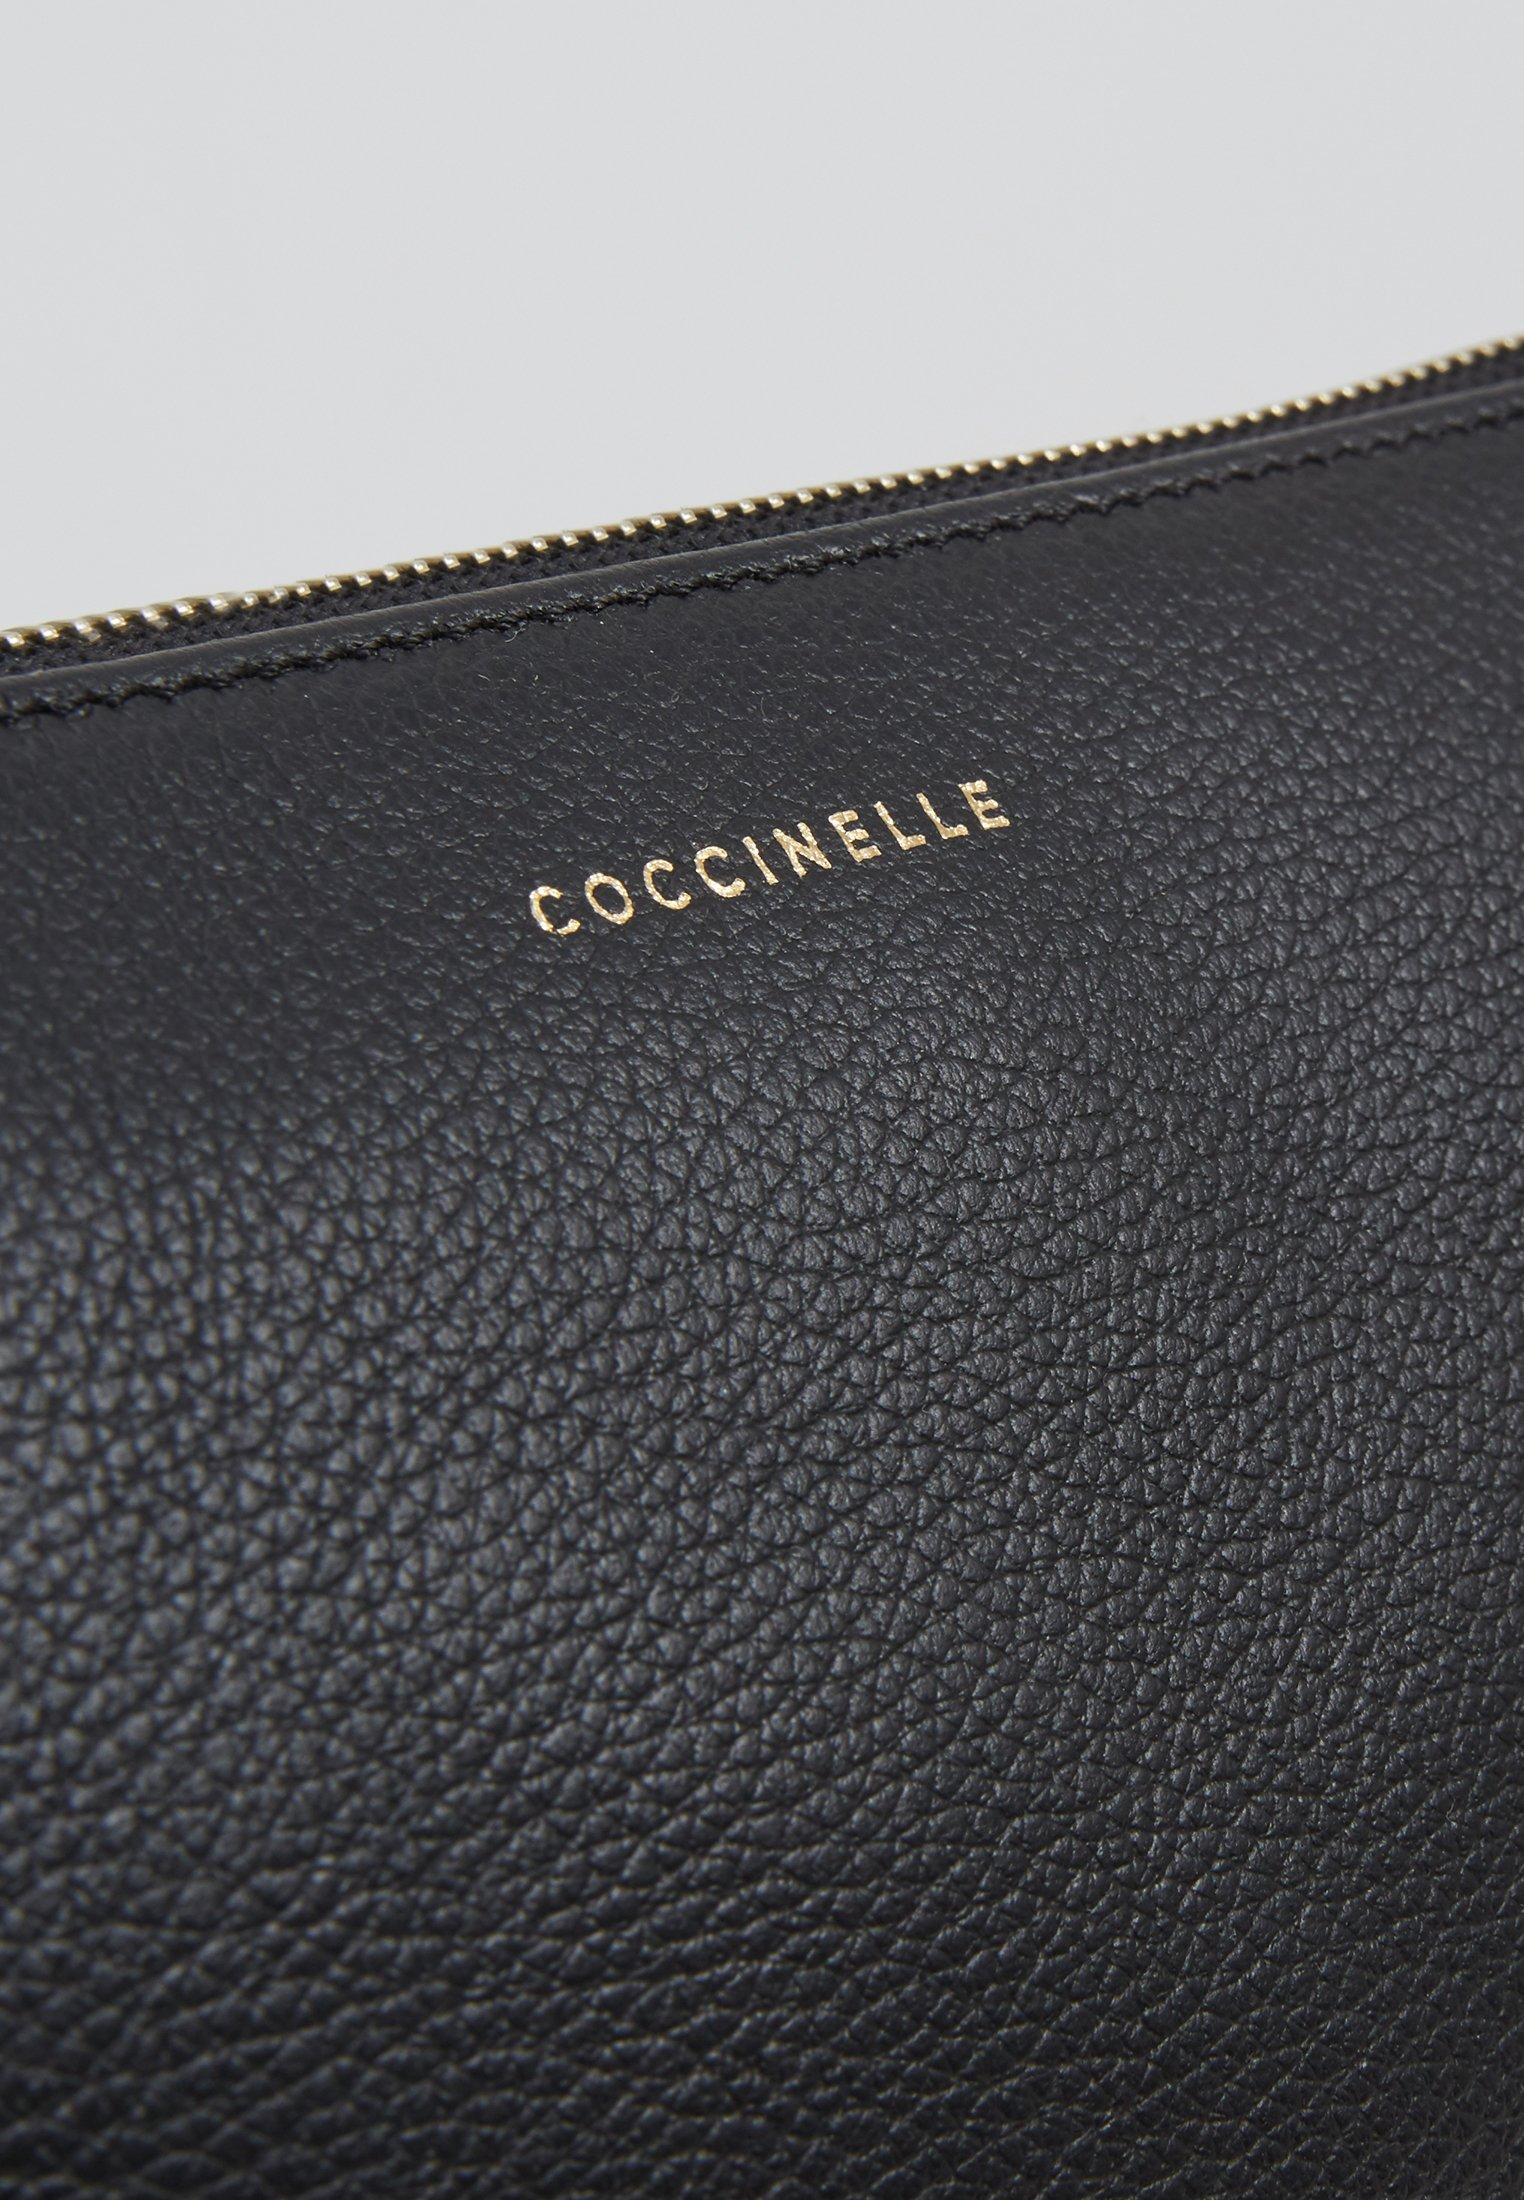 Coccinelle Best Crossbody Soft - Pochette Noir